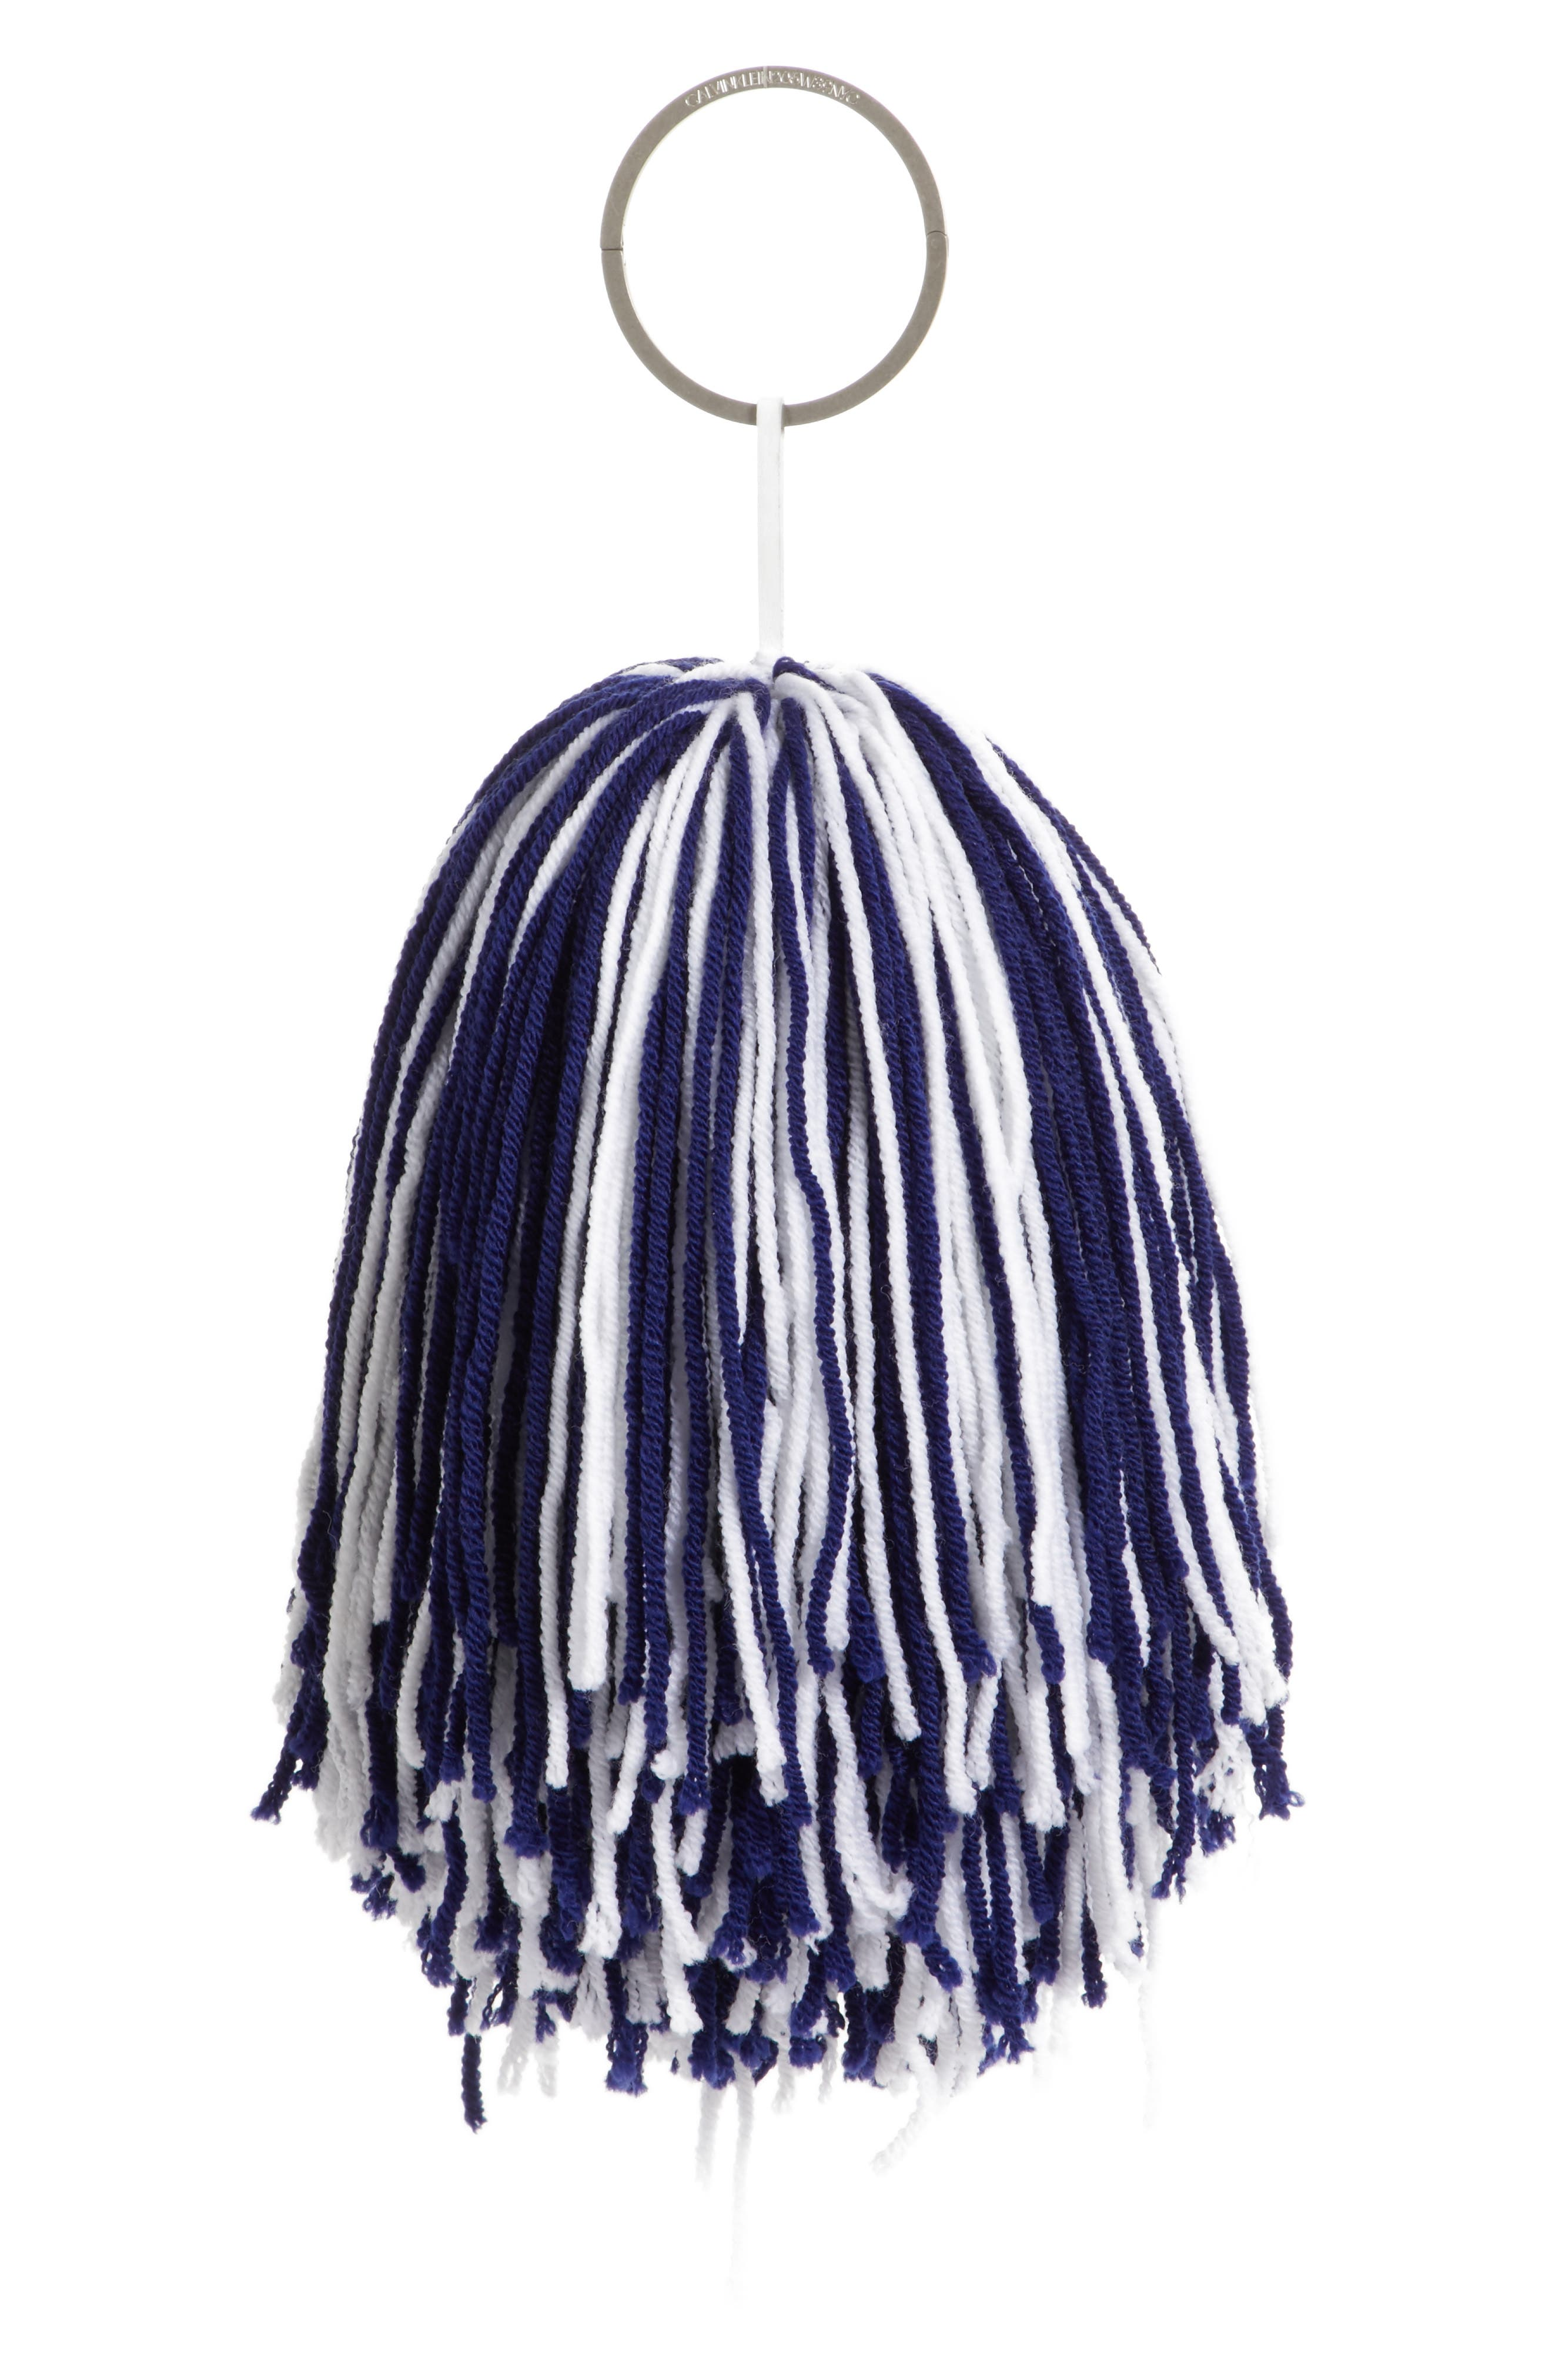 Pompom Bag Charm,                         Main,                         color, ROYAL BLUE/ WHITE